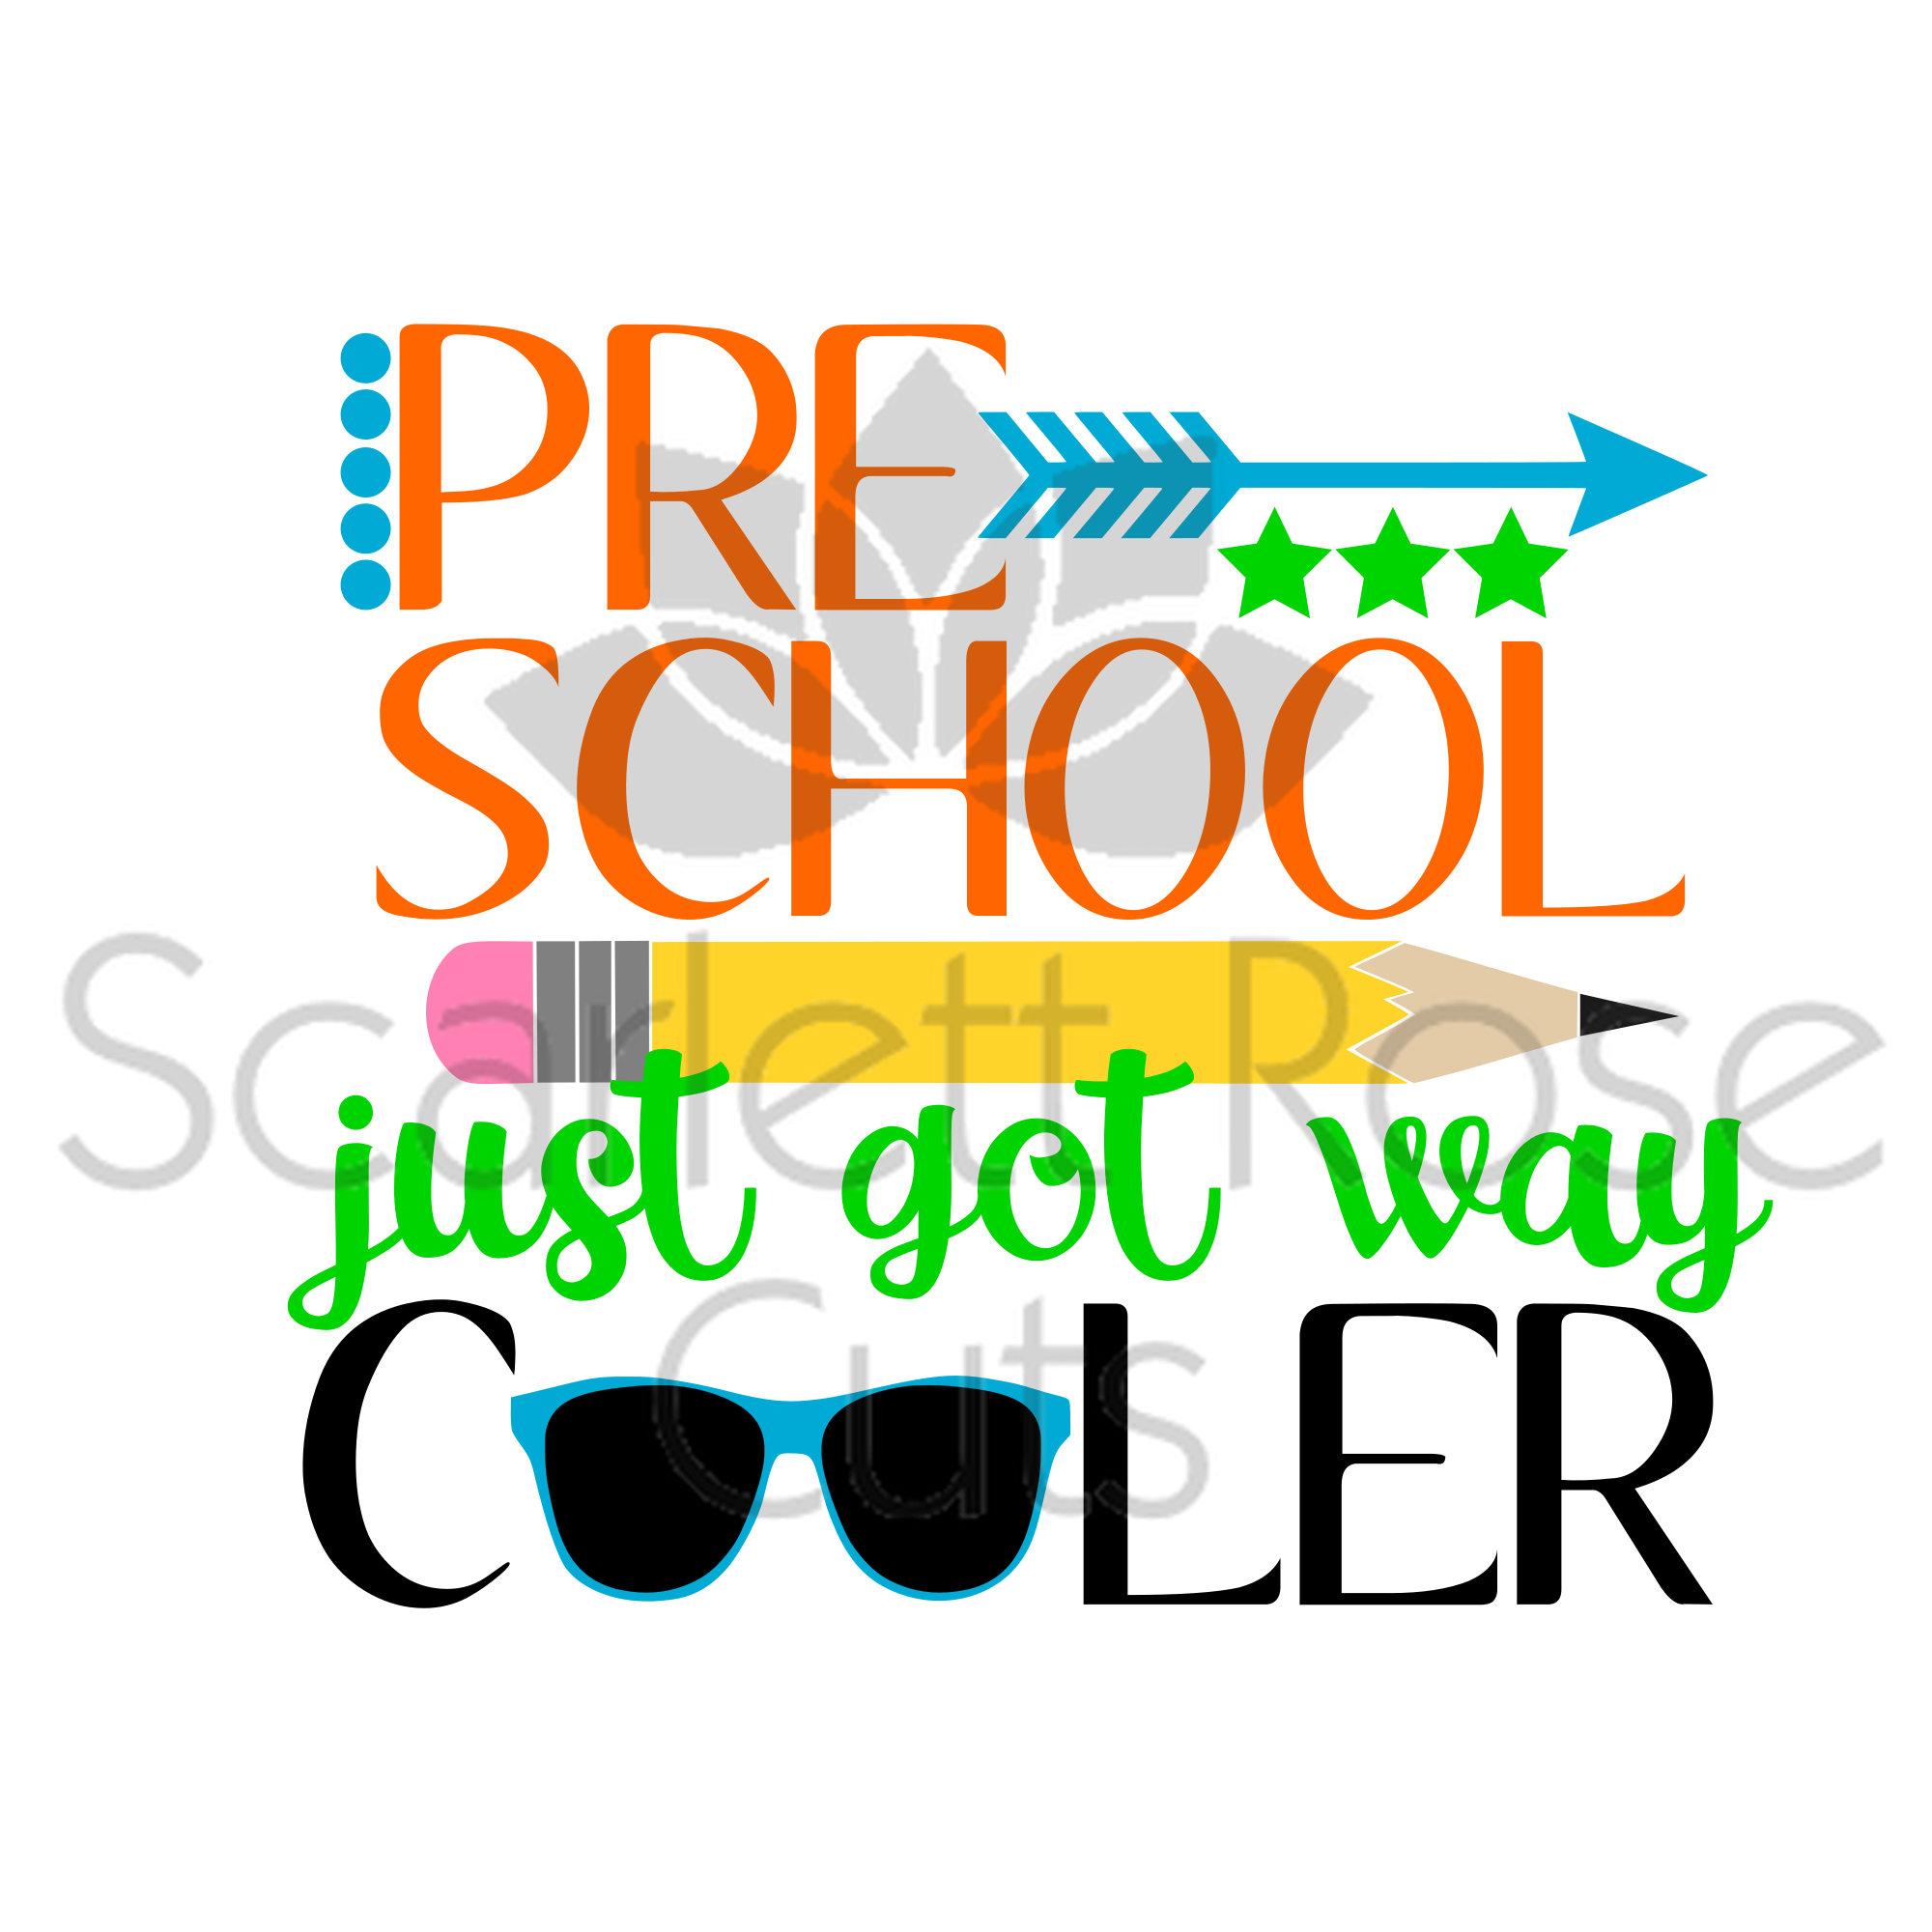 2000x2000 Preschool Just Got Way Cooler Back To School, First Day Of School